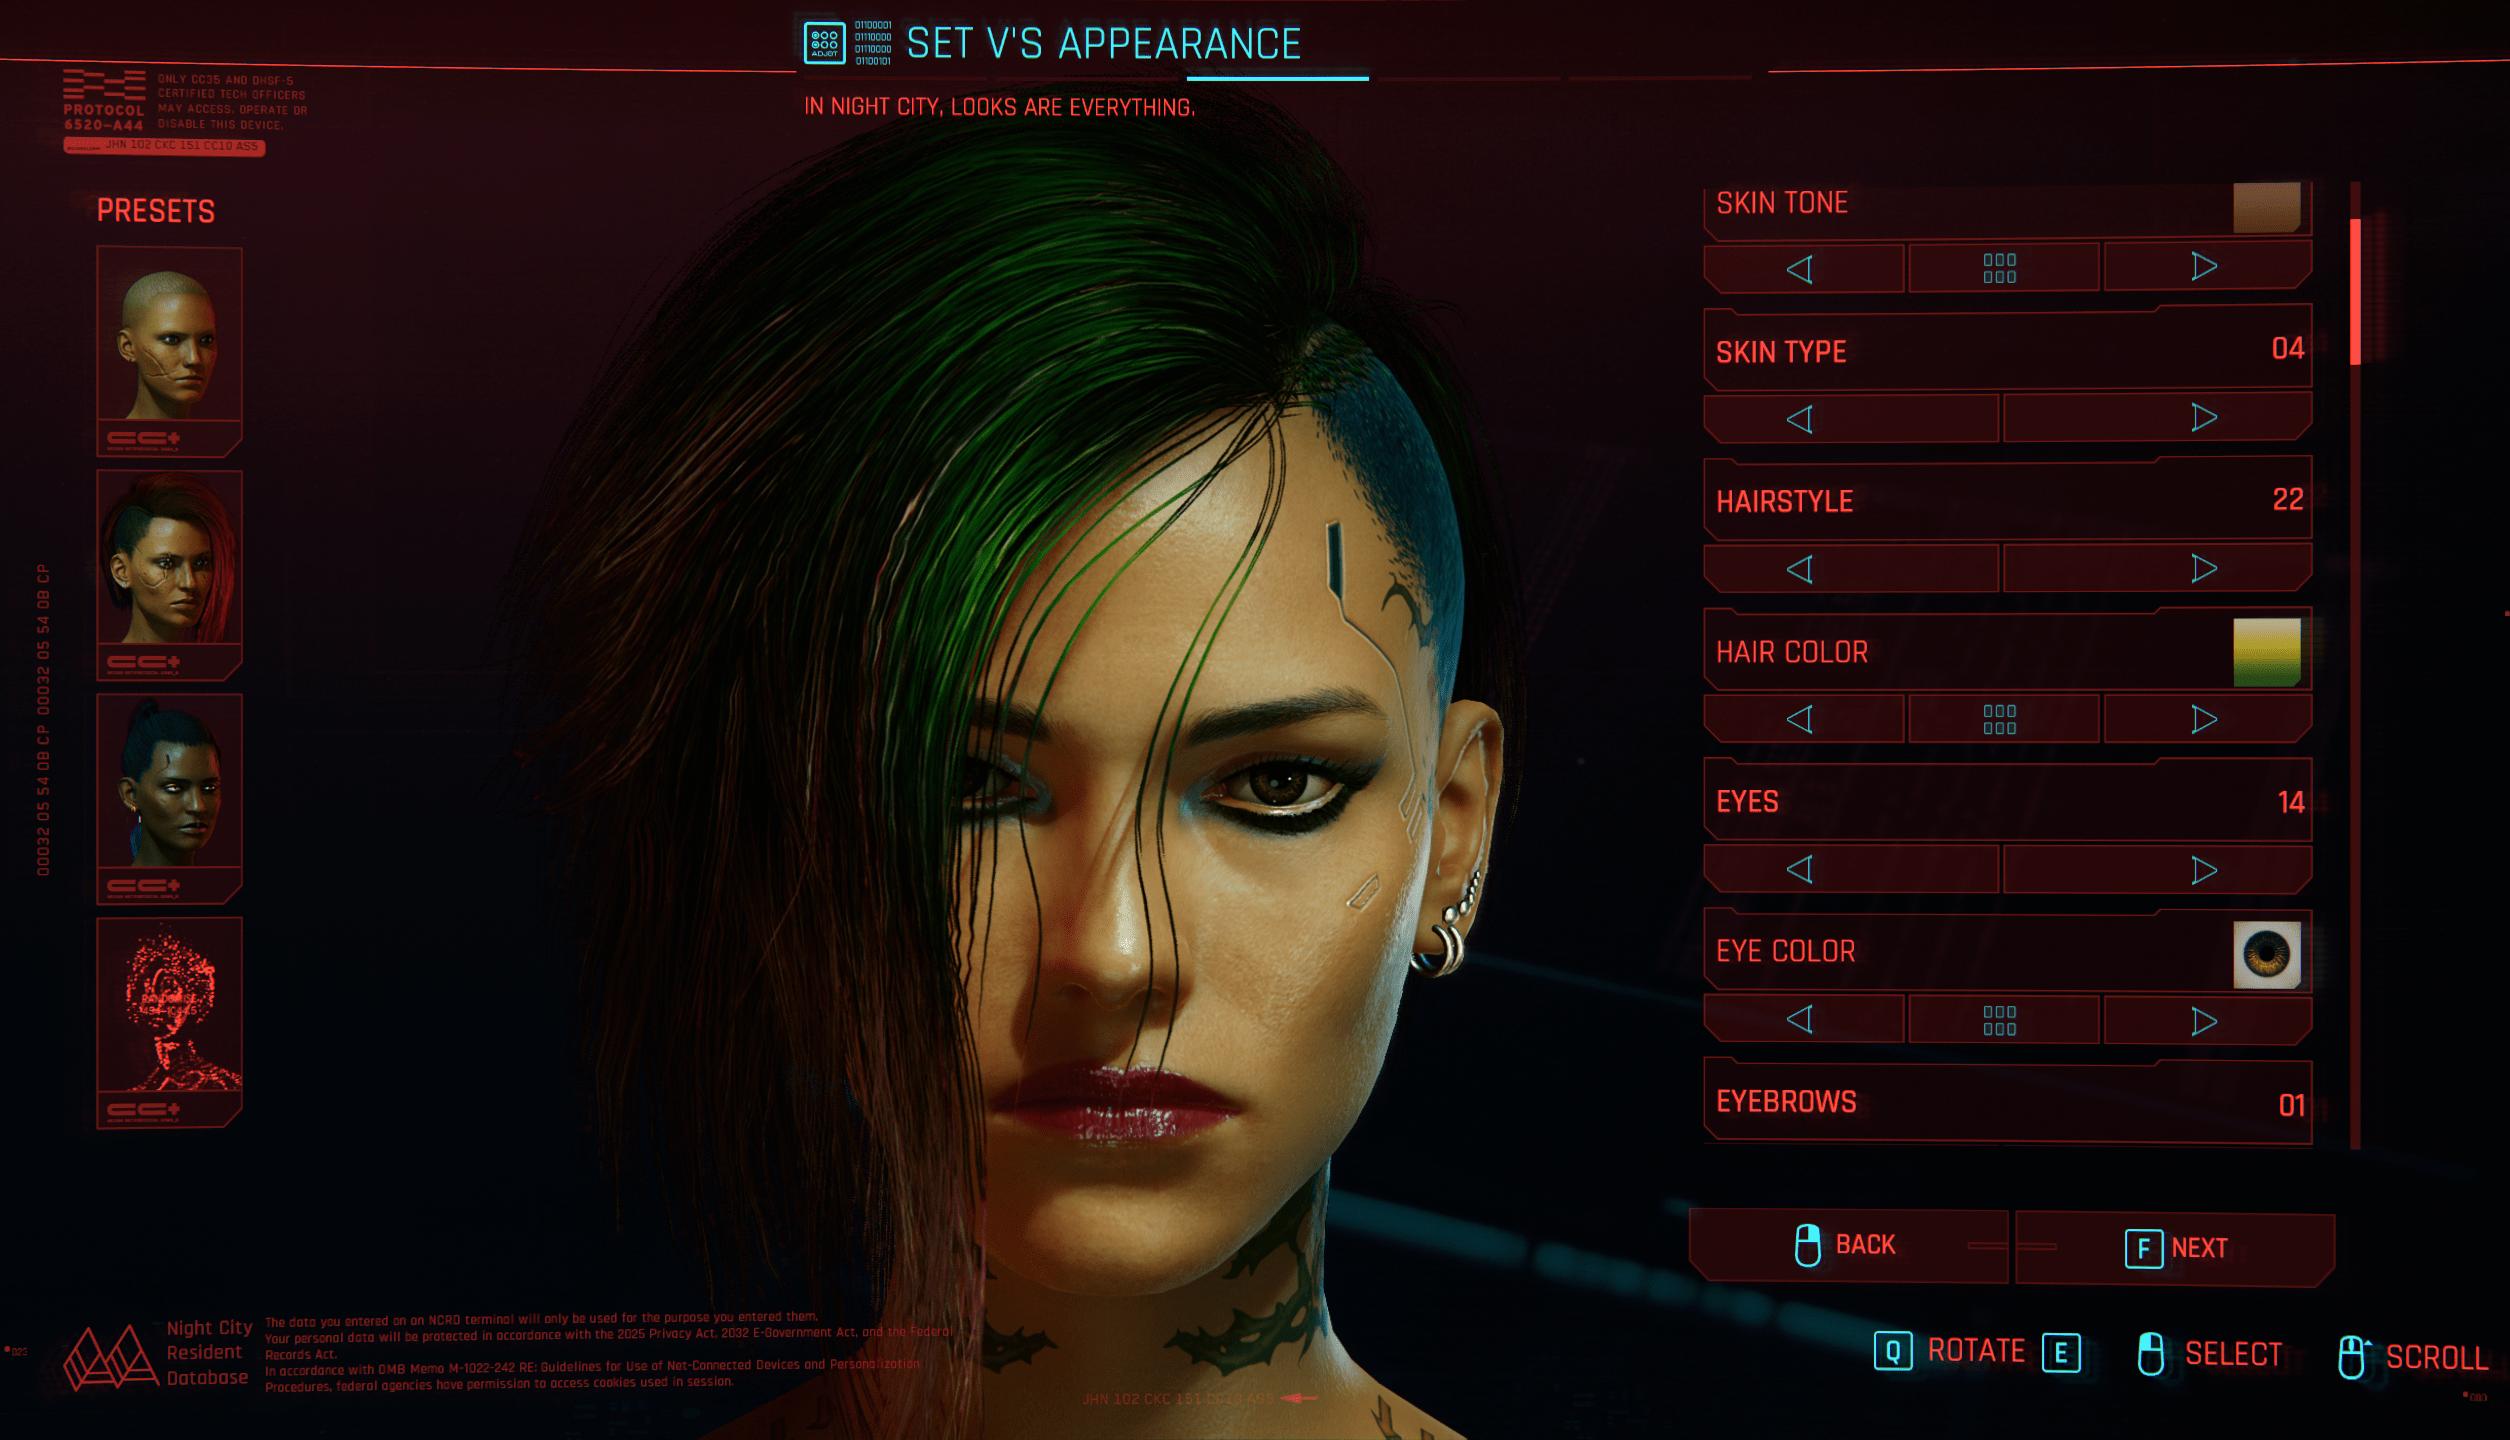 Judy Approved Female V (Preset File) - Cyberpunk 2077 Mod